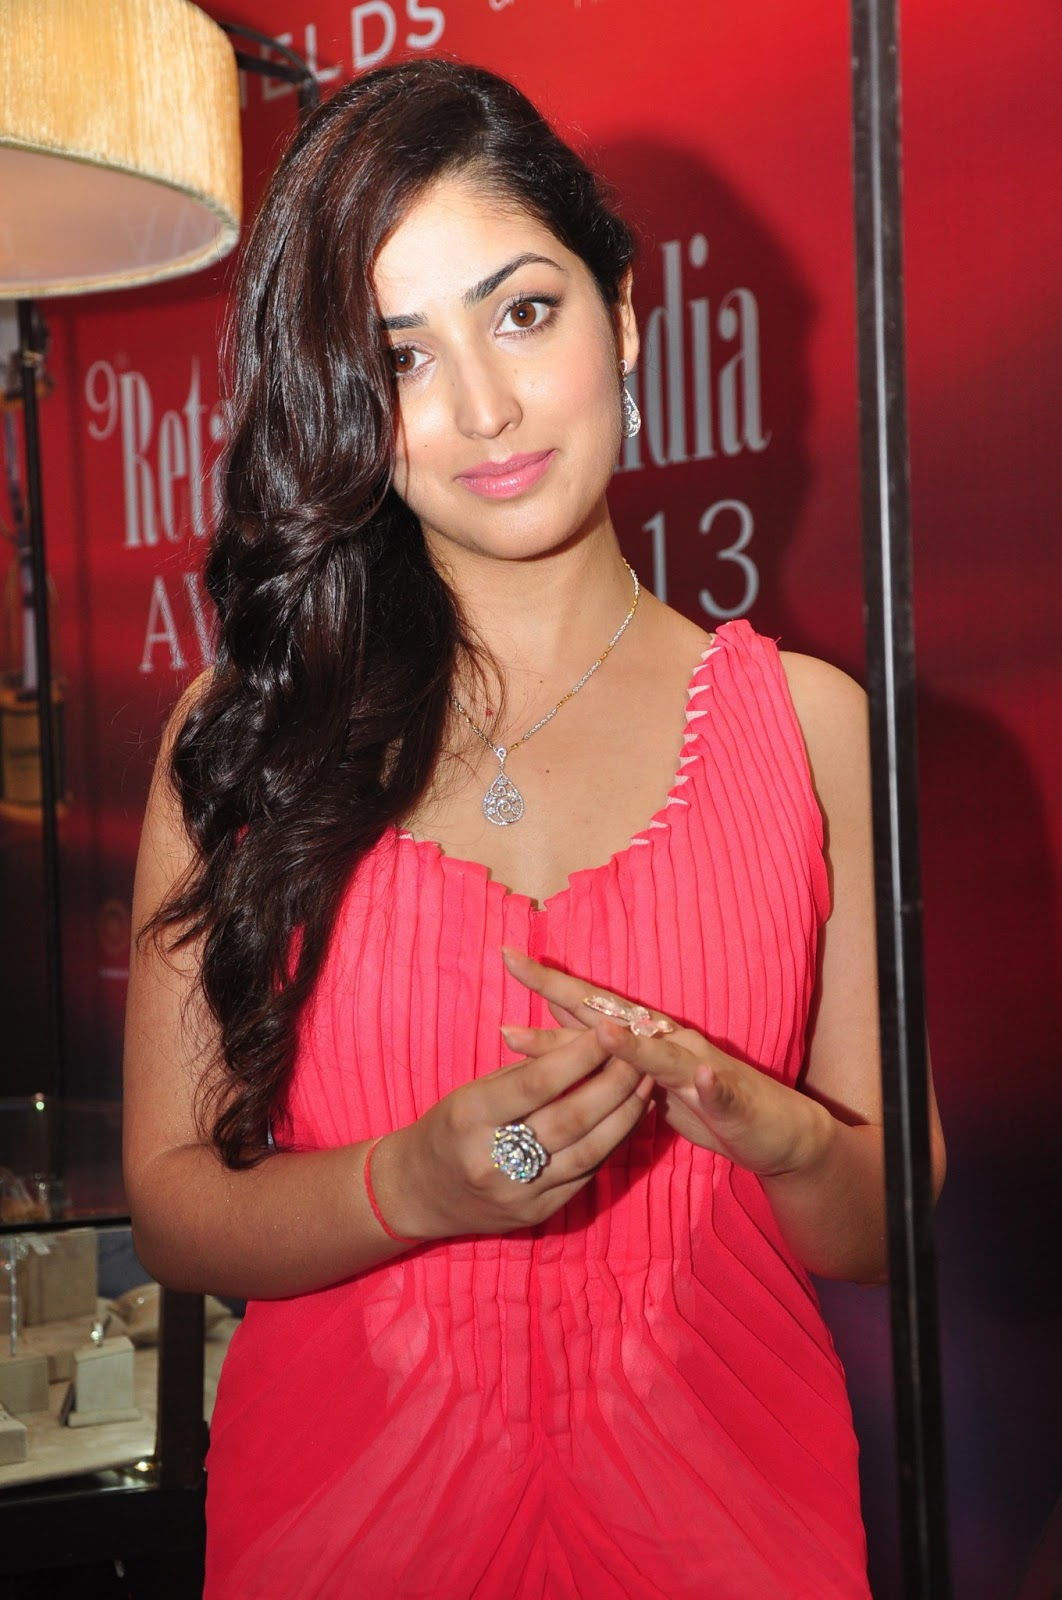 Romantic Lip Kiss Hd Wallpaper Yami Gautam Gorgeous In Pink Dress At Retail Jeweller